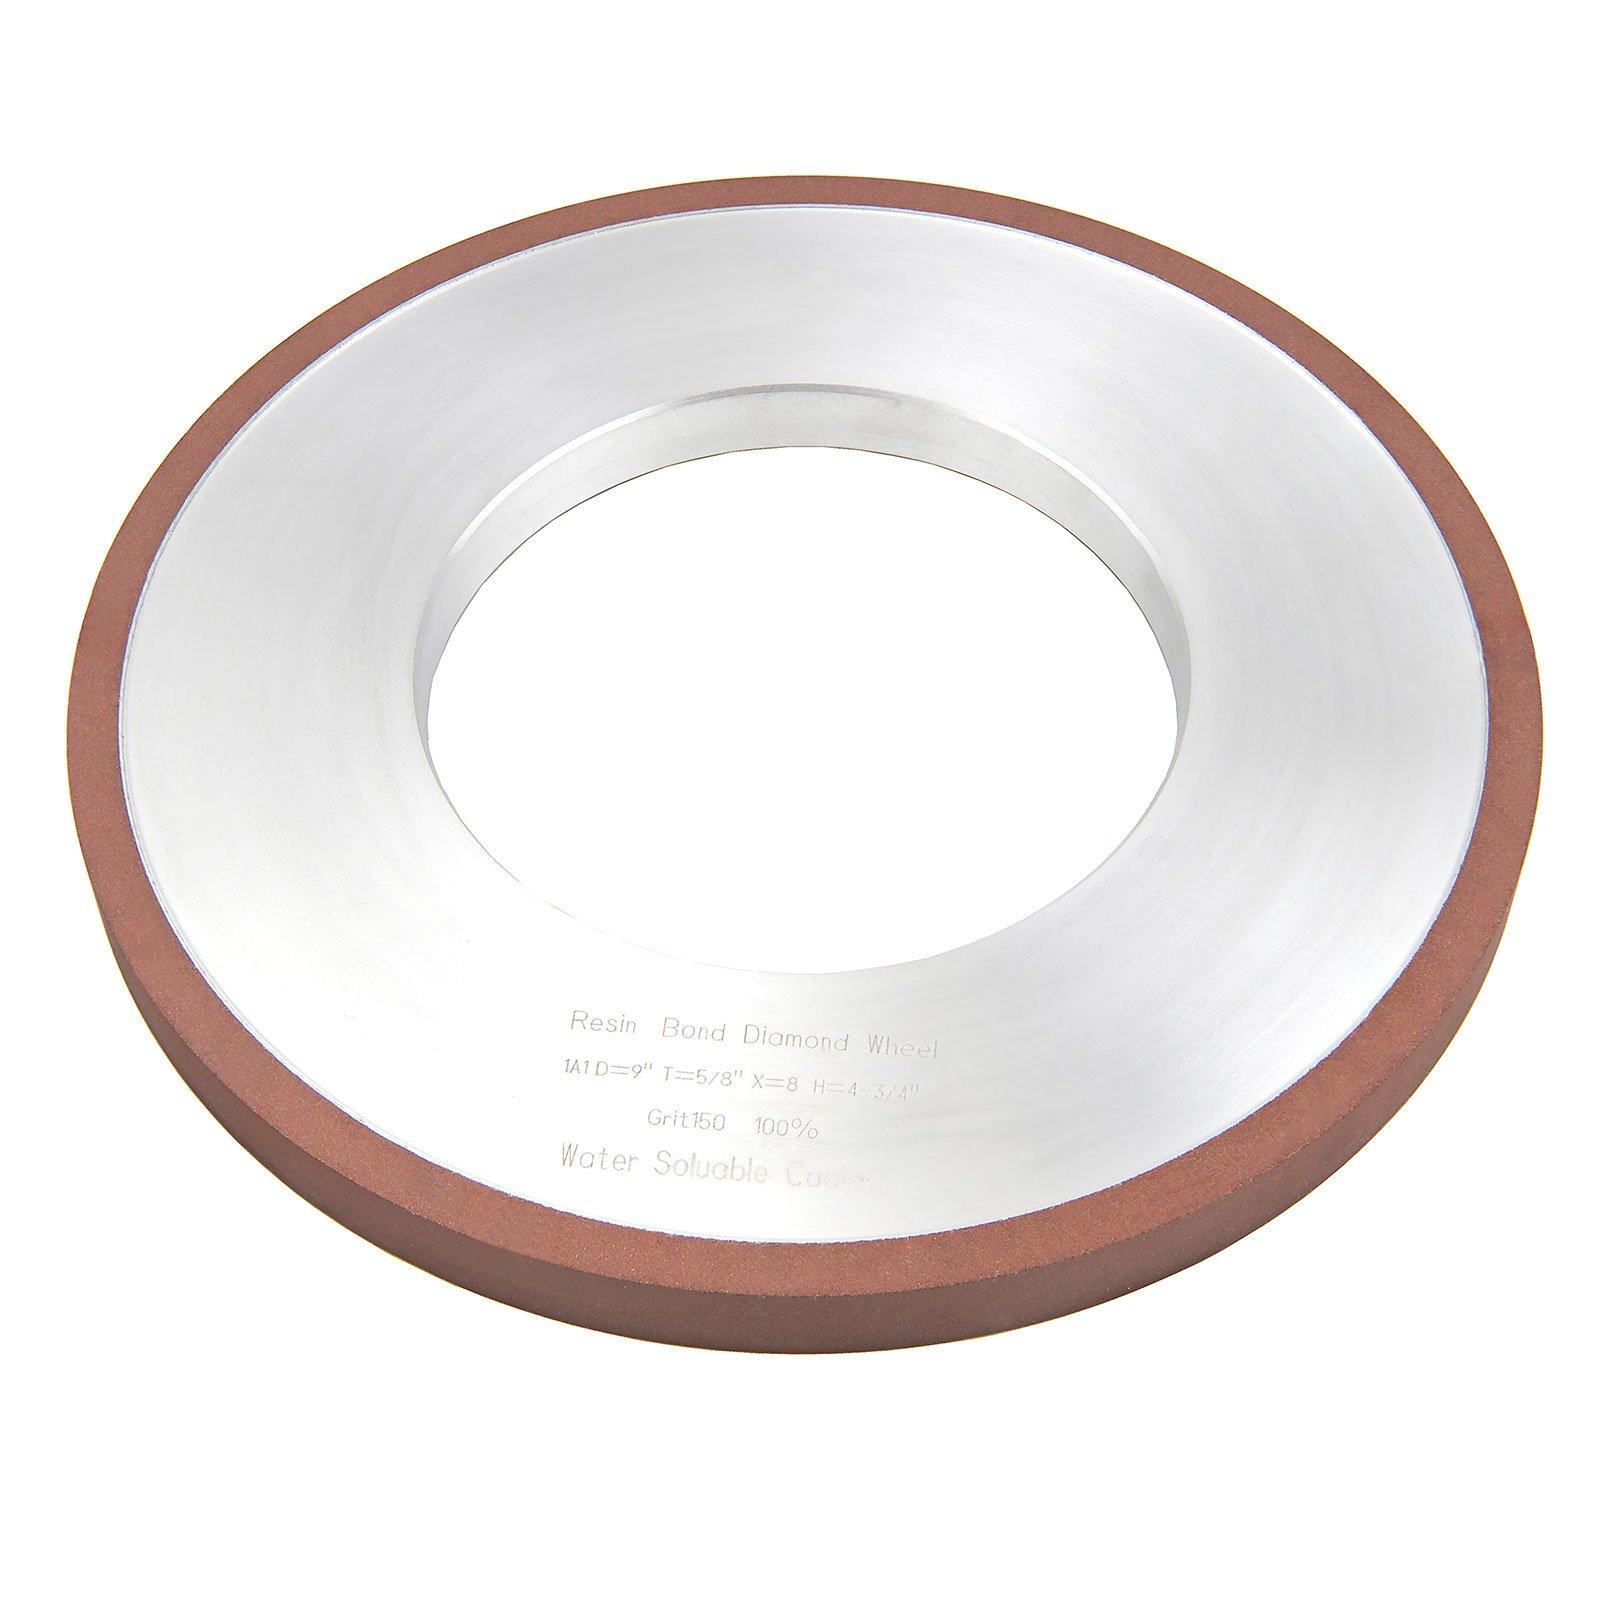 MaxTool OD 12'' Thick 3/4'' Diamond Plain Wheel Bore 5'' Grit 180 Resin Bond; NDR1A1D12T19X6G18